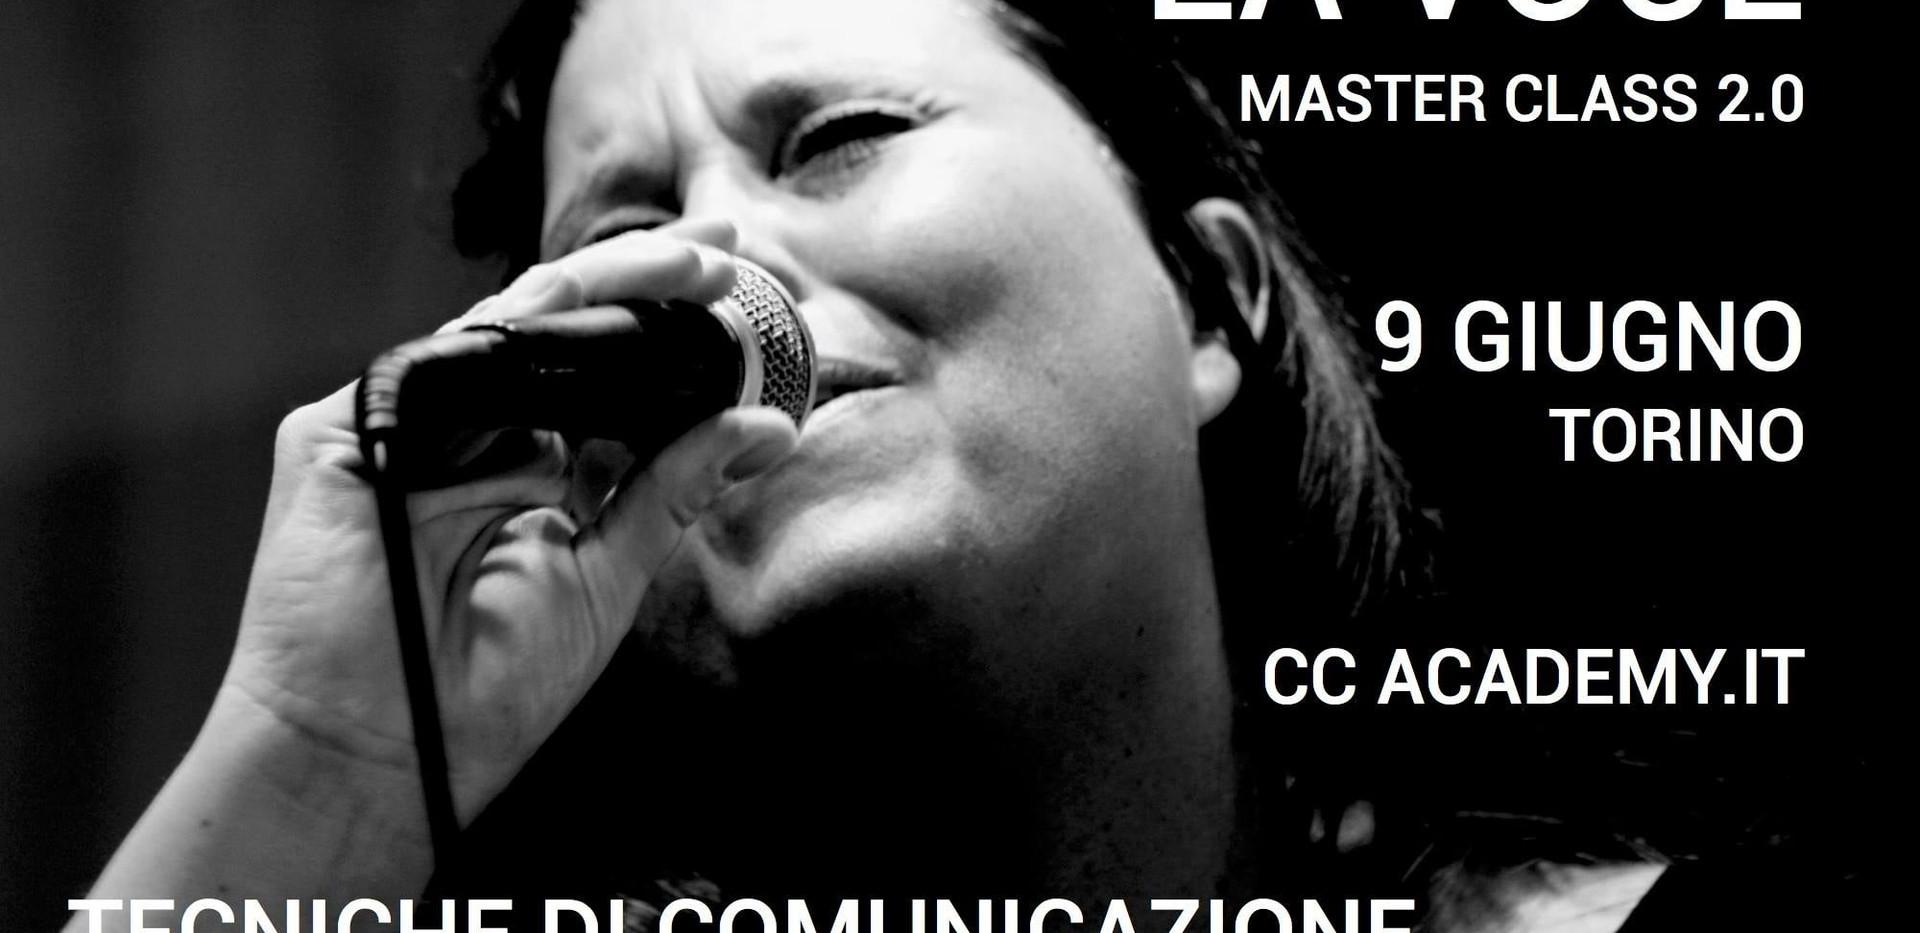 Carola Cora Master Class.jpg